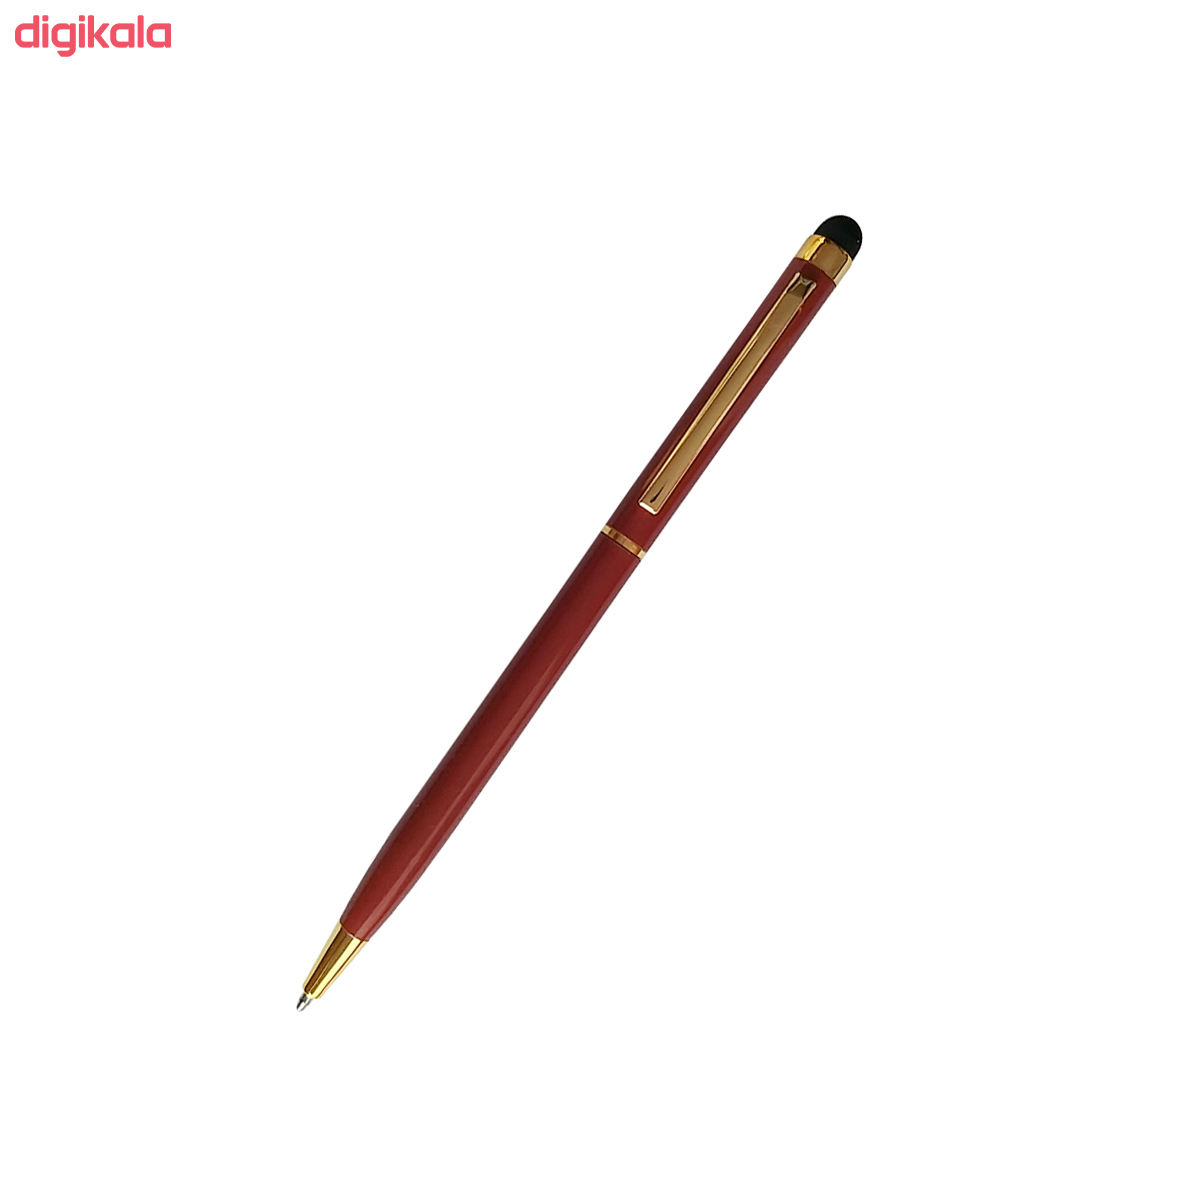 قلم لمسی کد SQMKZX02369 main 1 20